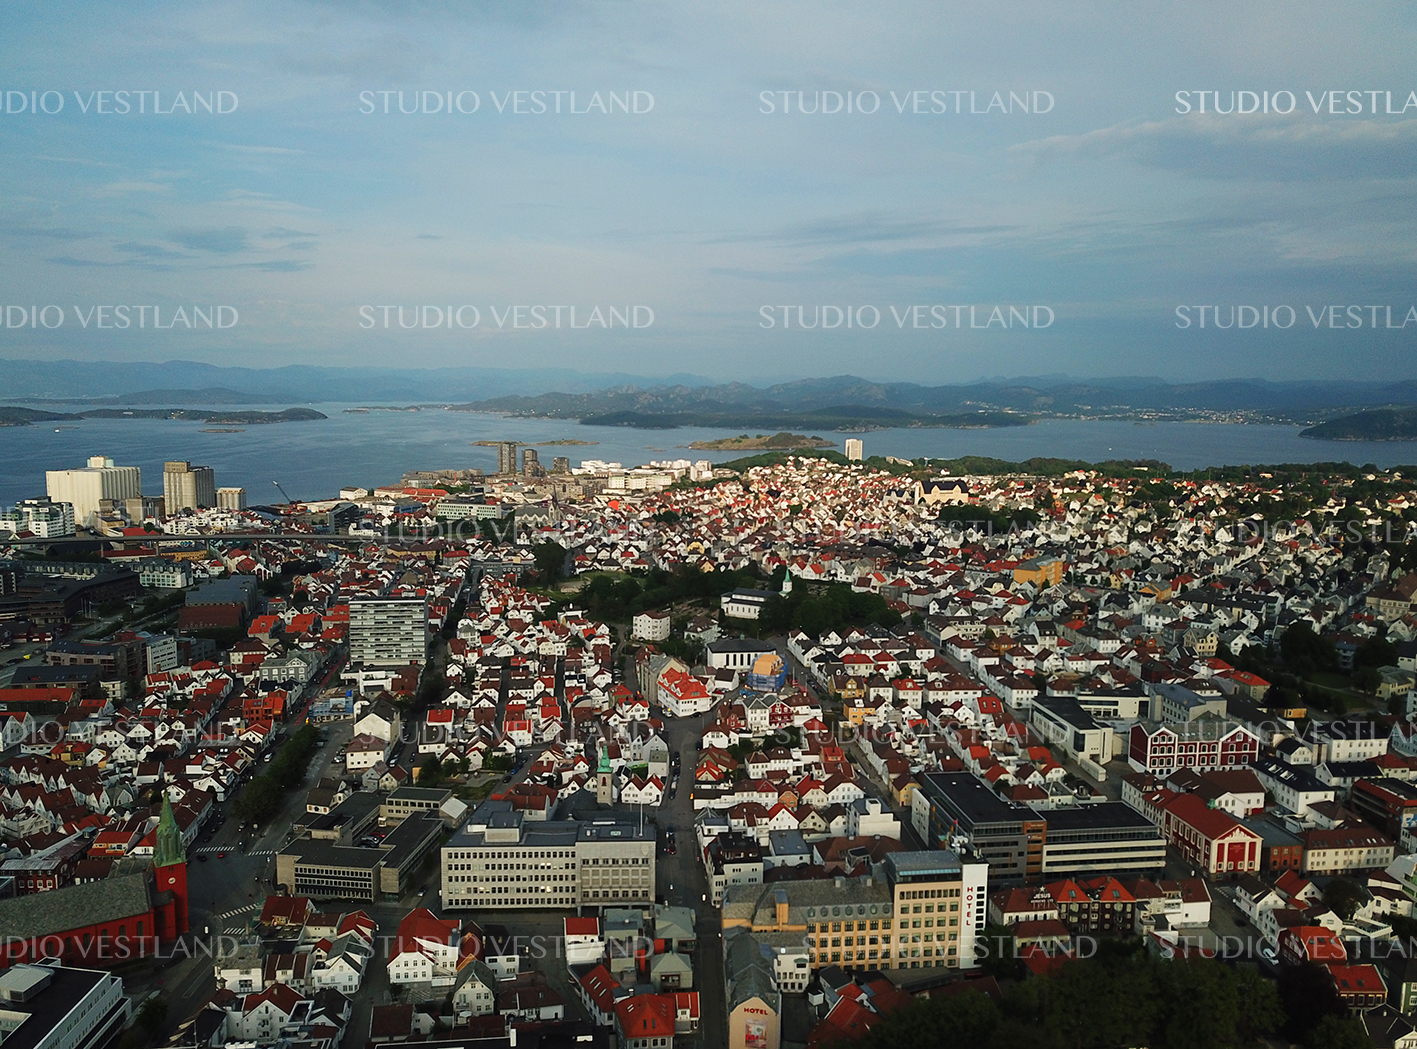 Studio Vestland - Stavanger 16